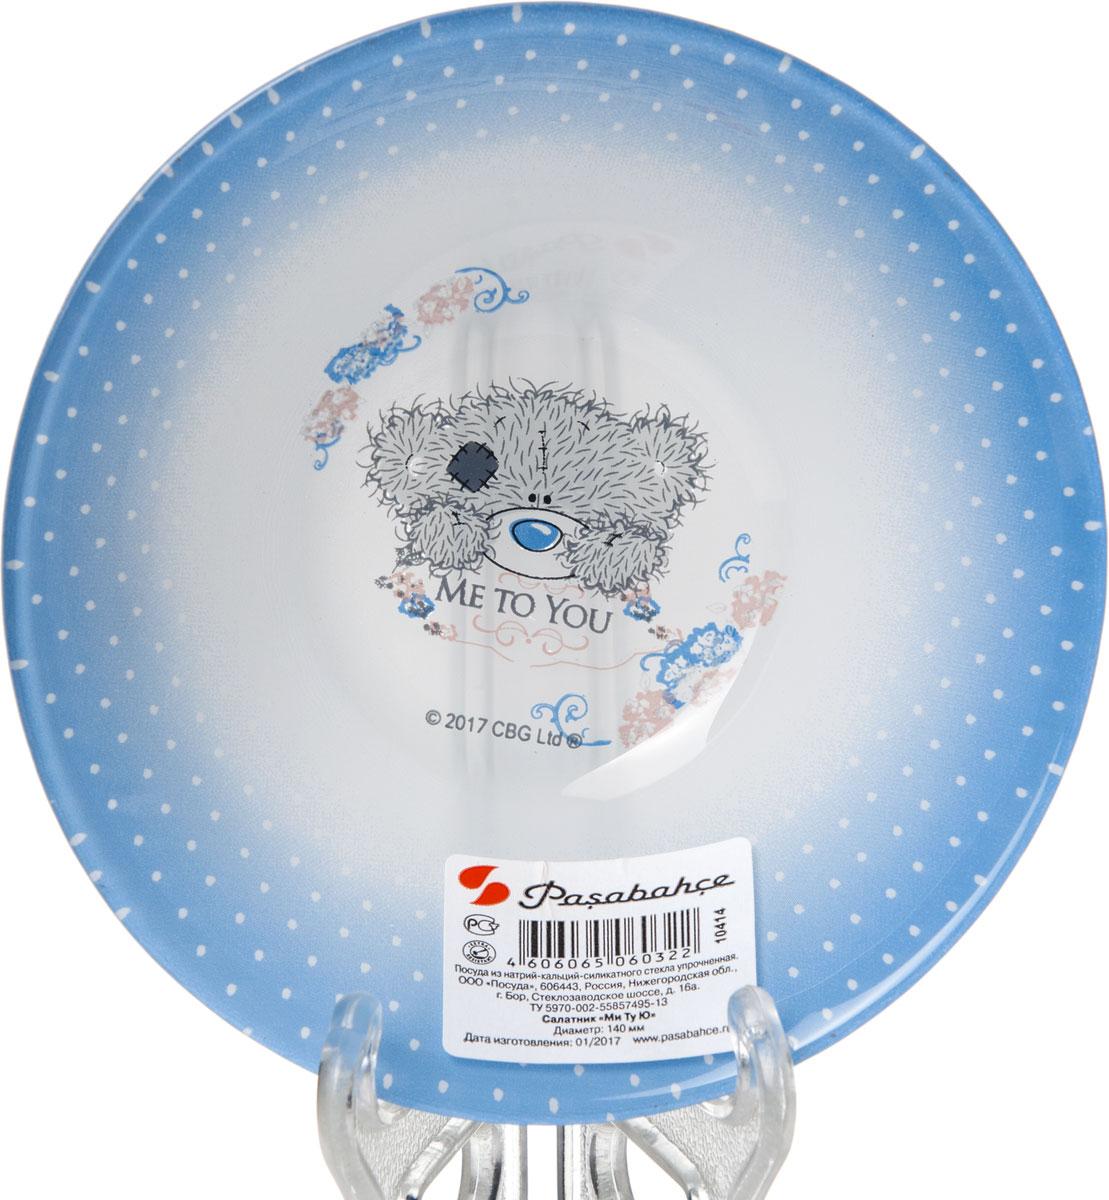 Салатник Pasabahce Me To You, цвет: голубой, диаметр 14 см салатник pasabahce pleasure 14 см